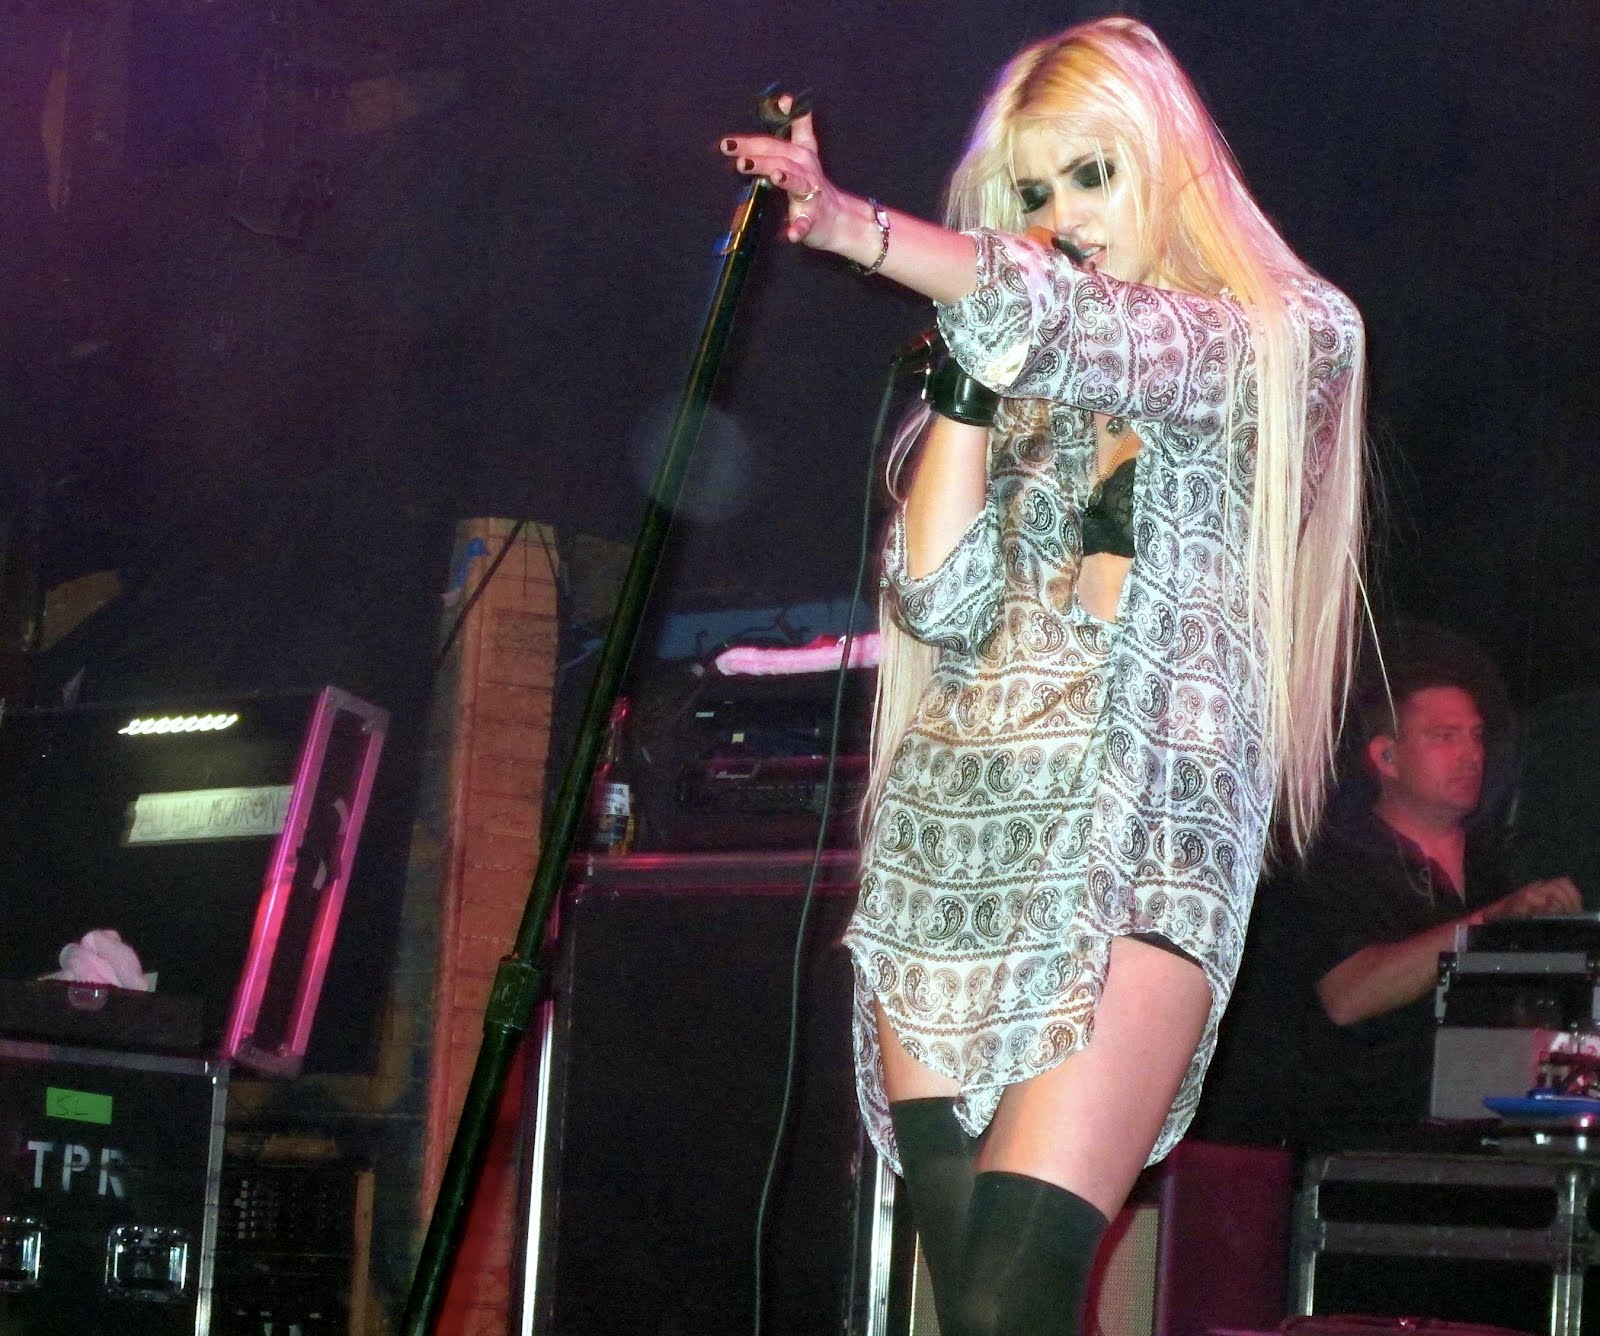 Celebrities Spy: Taylor Momsen Performs Live at House of ... Taylor Momsen Live